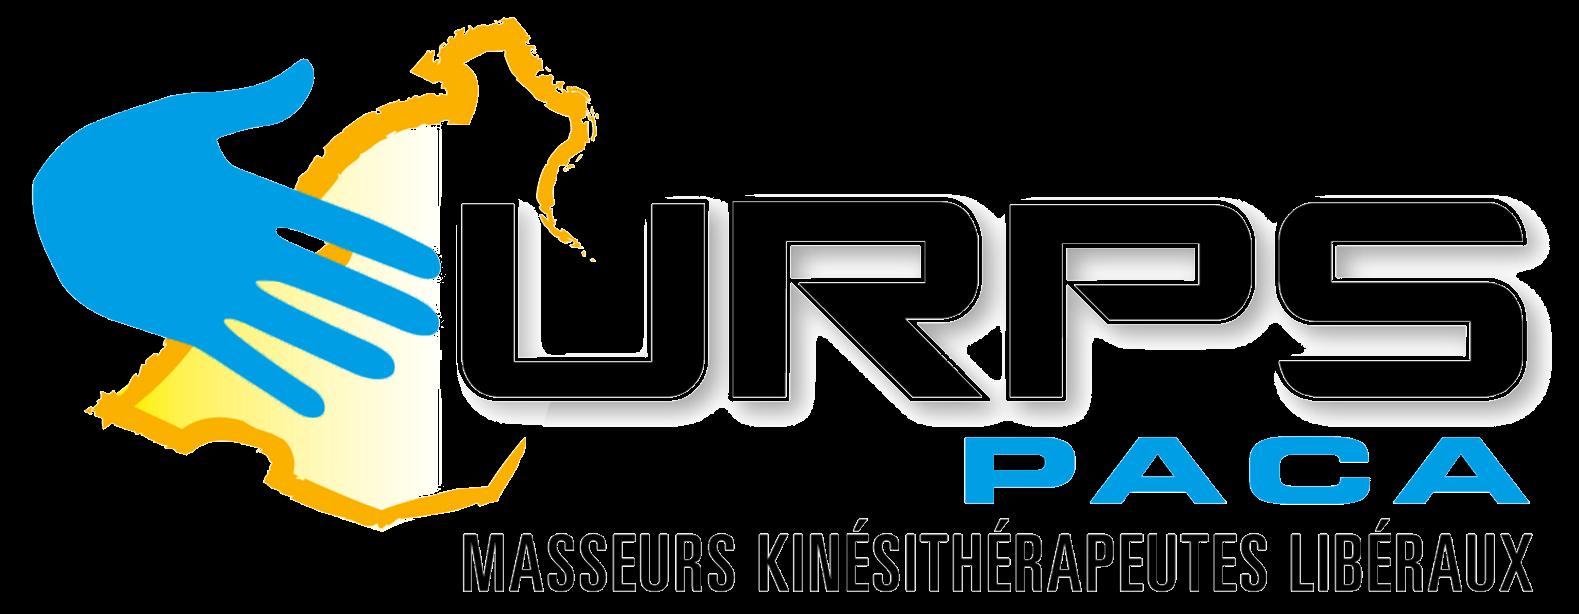 URPS MKL PACA